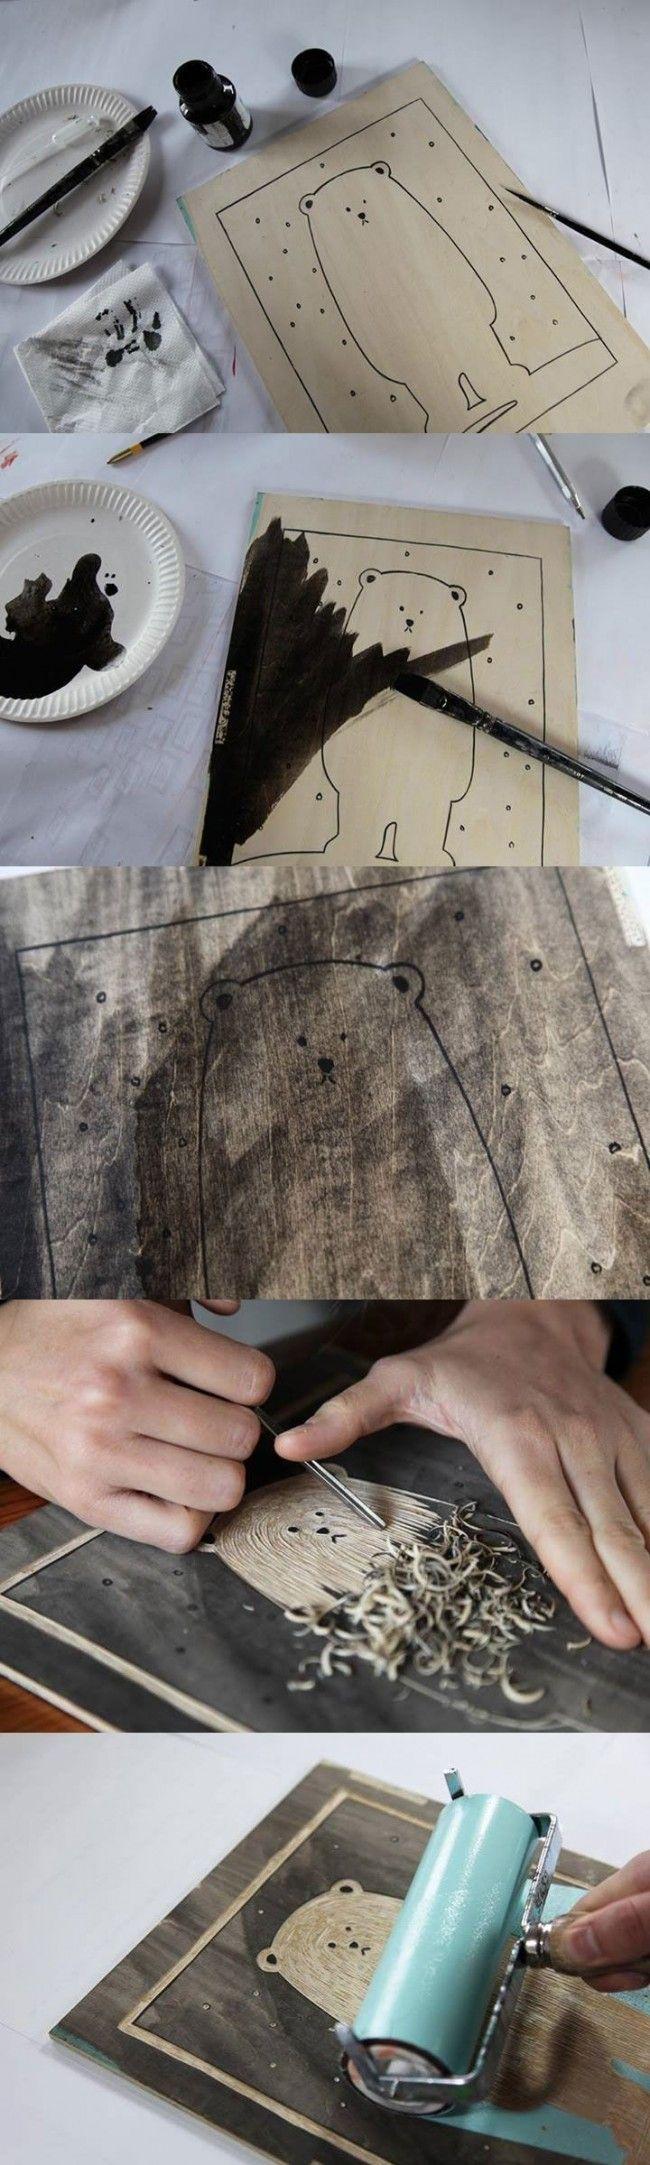 HappyModern.RU | Резьба по дереву (83 фото): фотографии, рисунки, эскизы | http://happymodern.ru